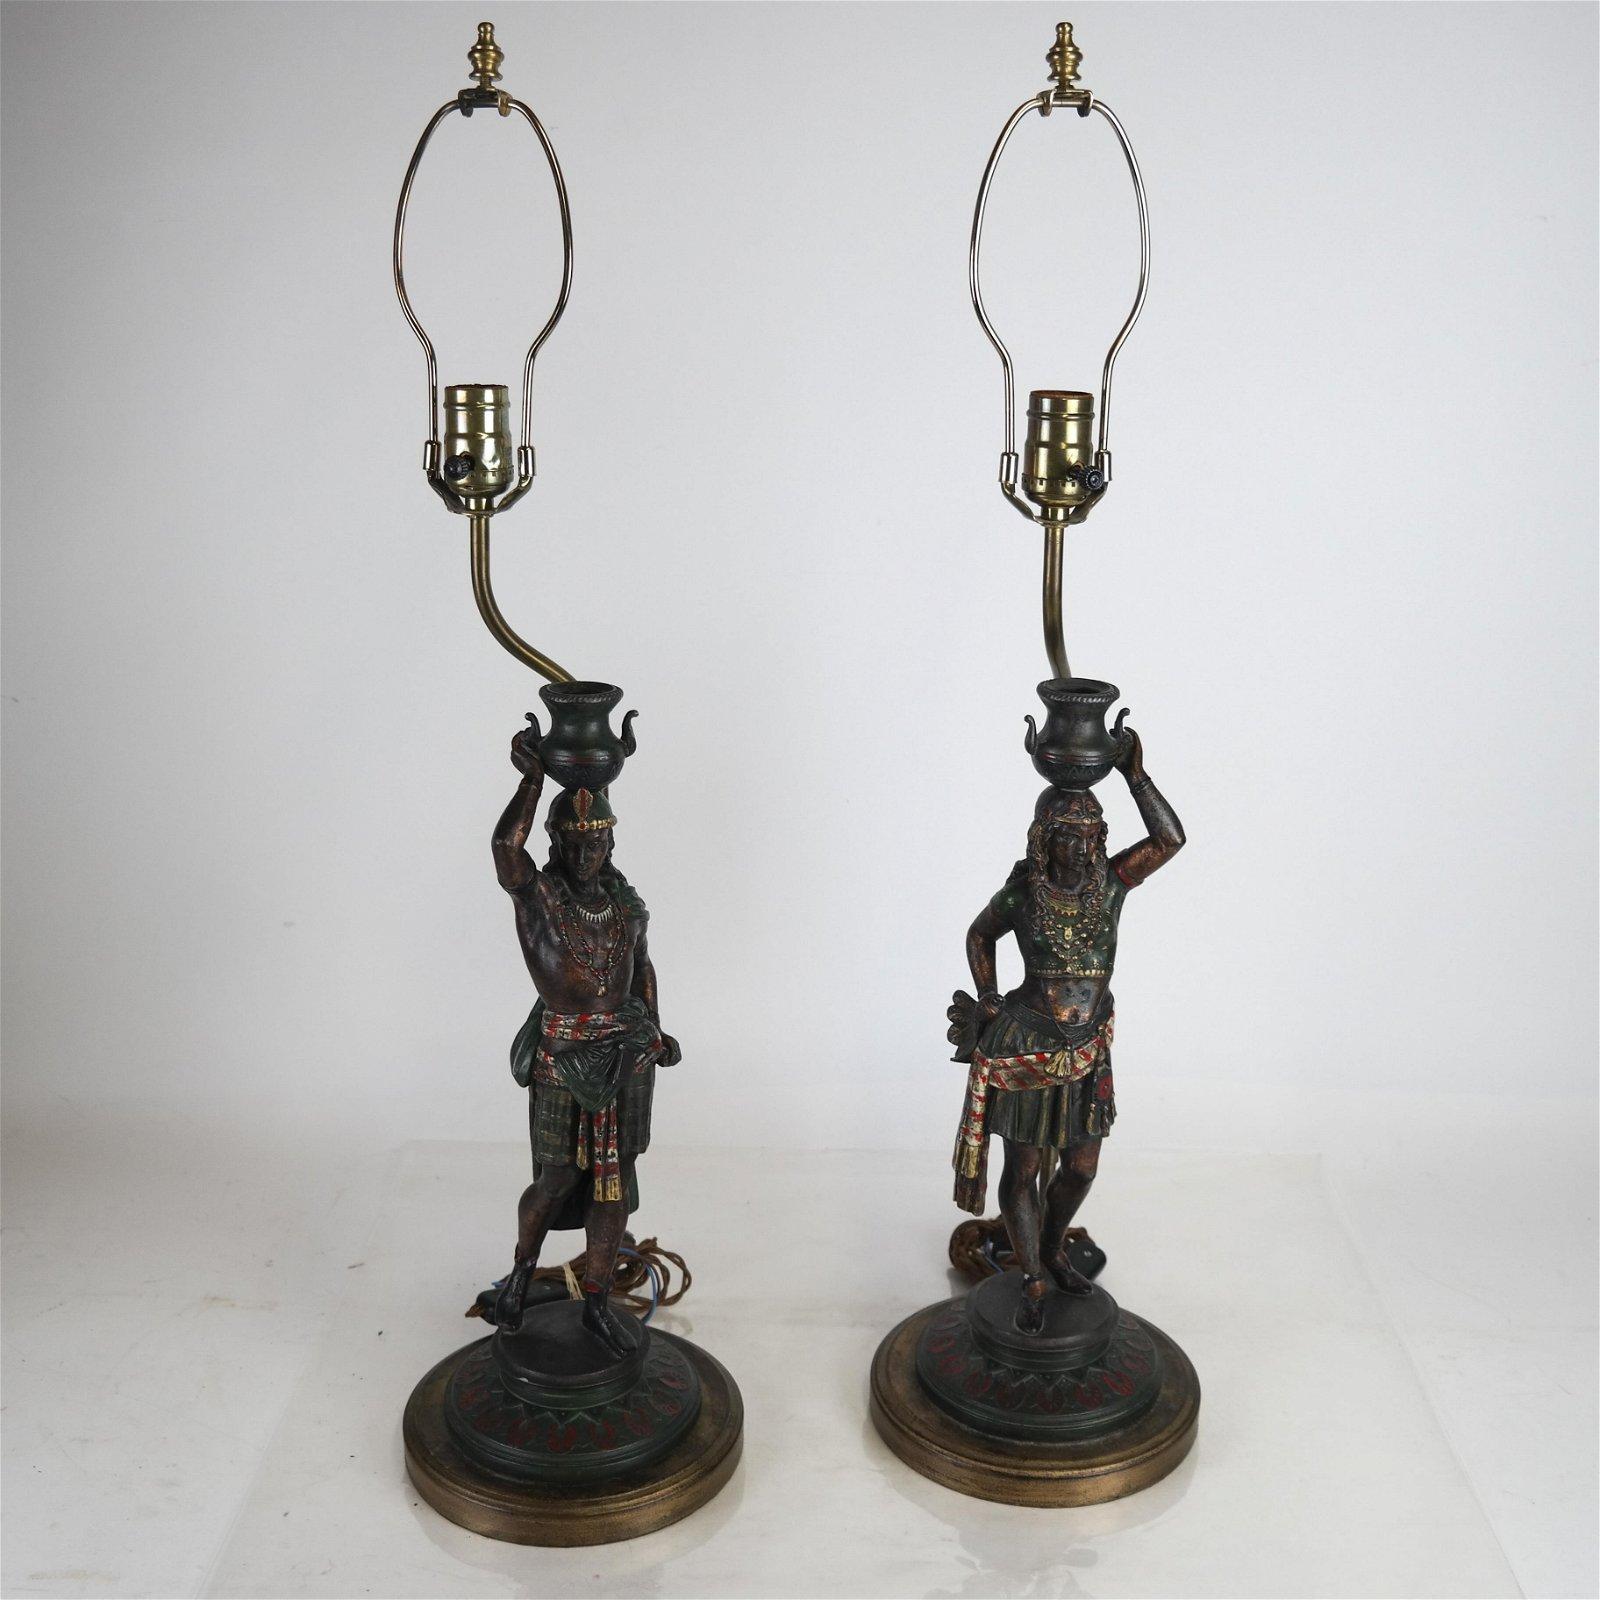 Pair 19th Century Orientalist-Style Figurine Lamps